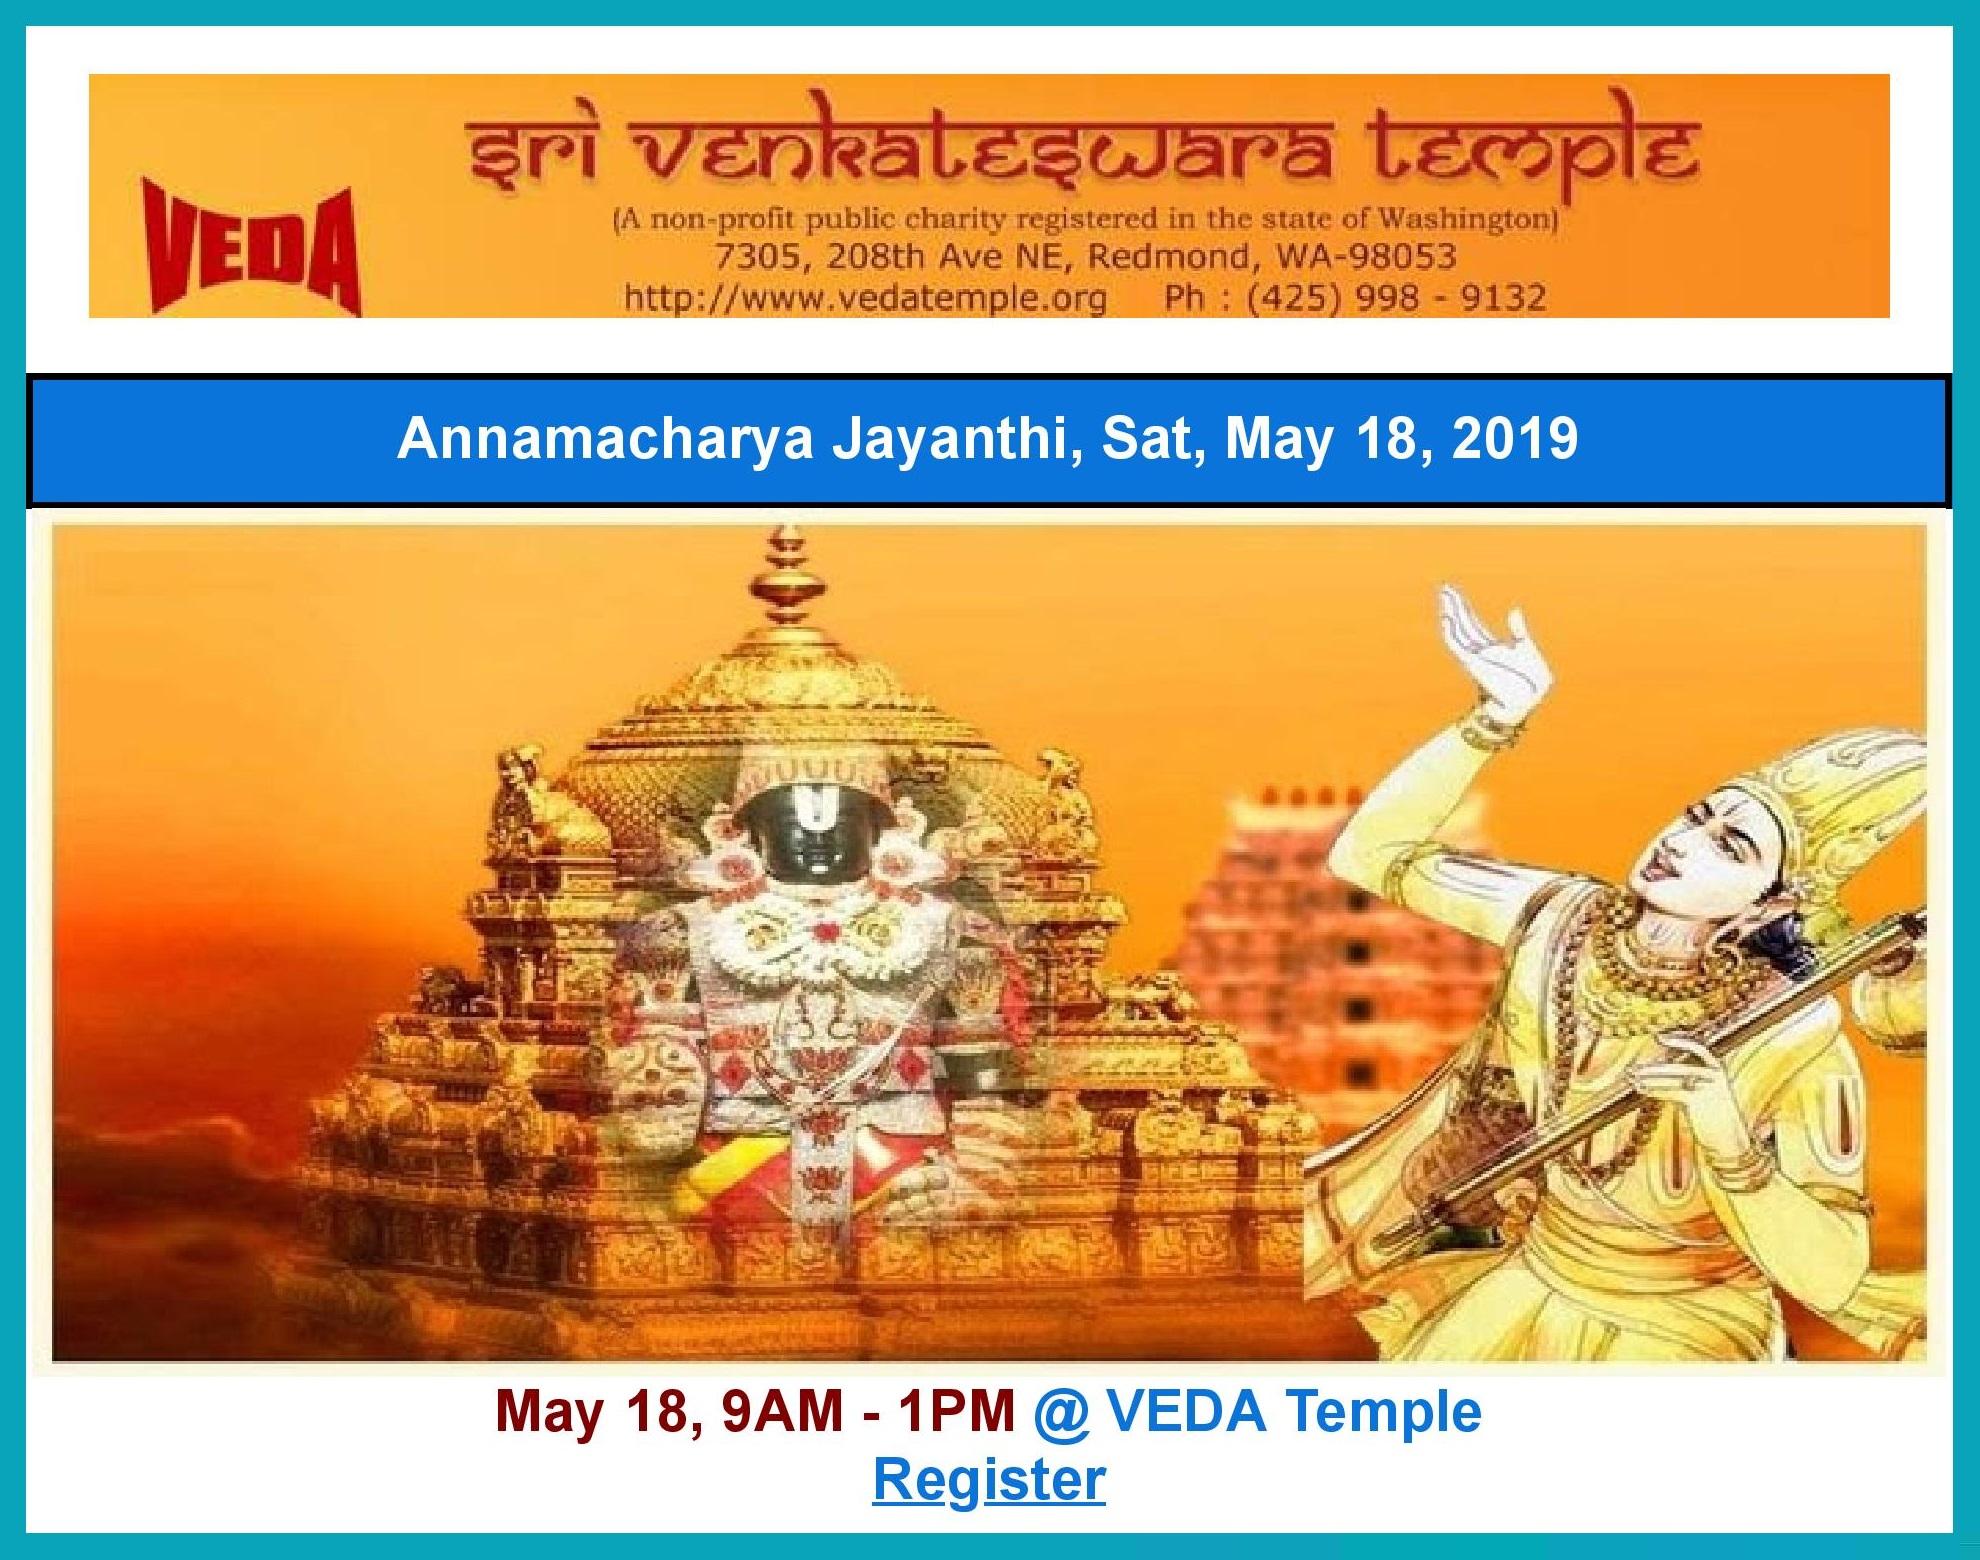 VEDA Temple Seattle Annamacharya Jayanthi 2019 | Carnatic America